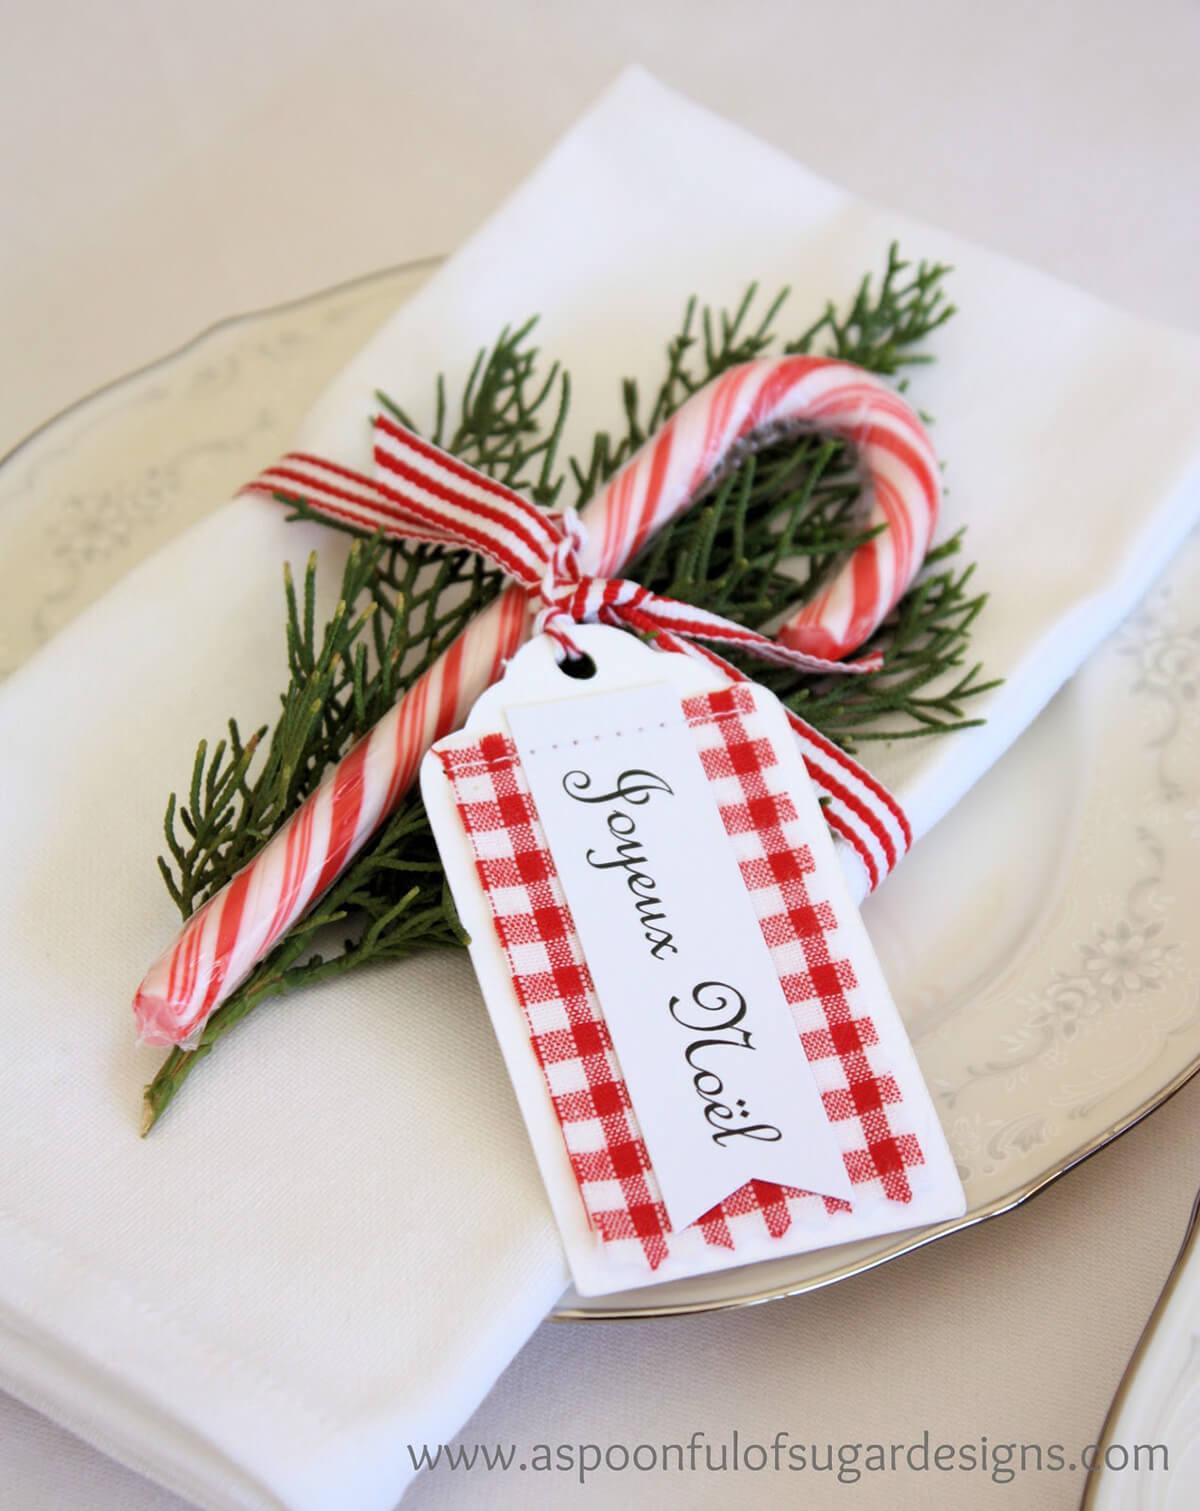 Joyeux Noel Candy Cane Napkin Favors